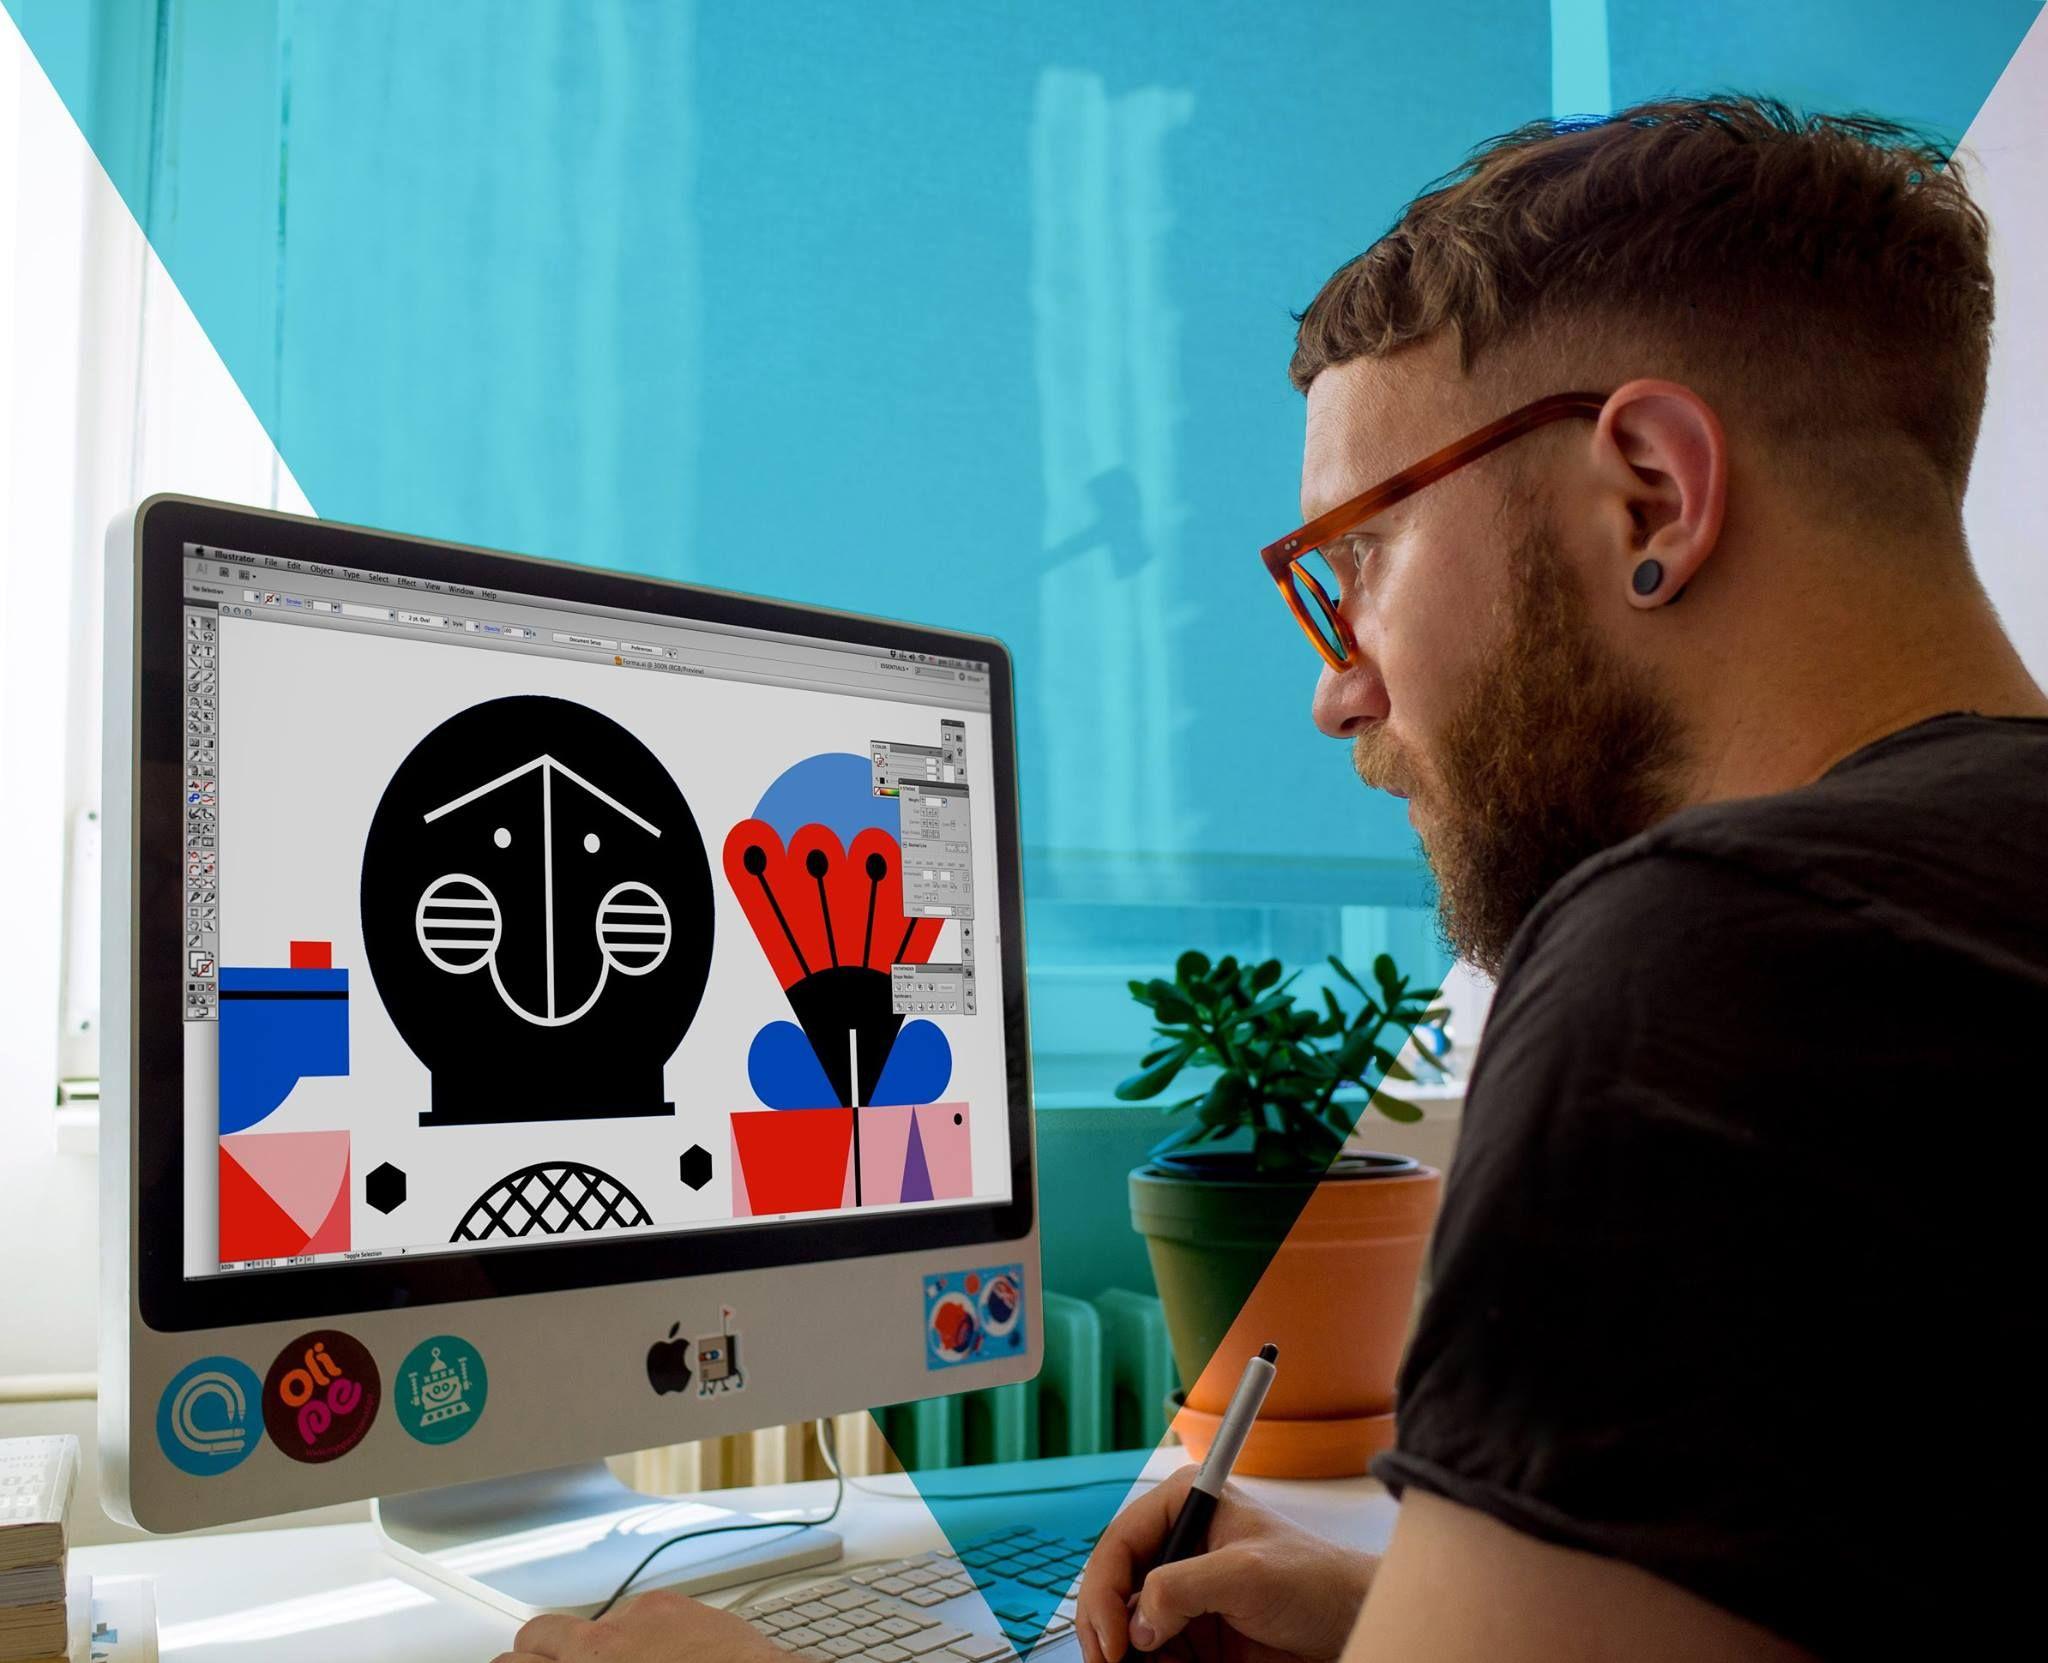 #style #illustrator #illustration #art #digital